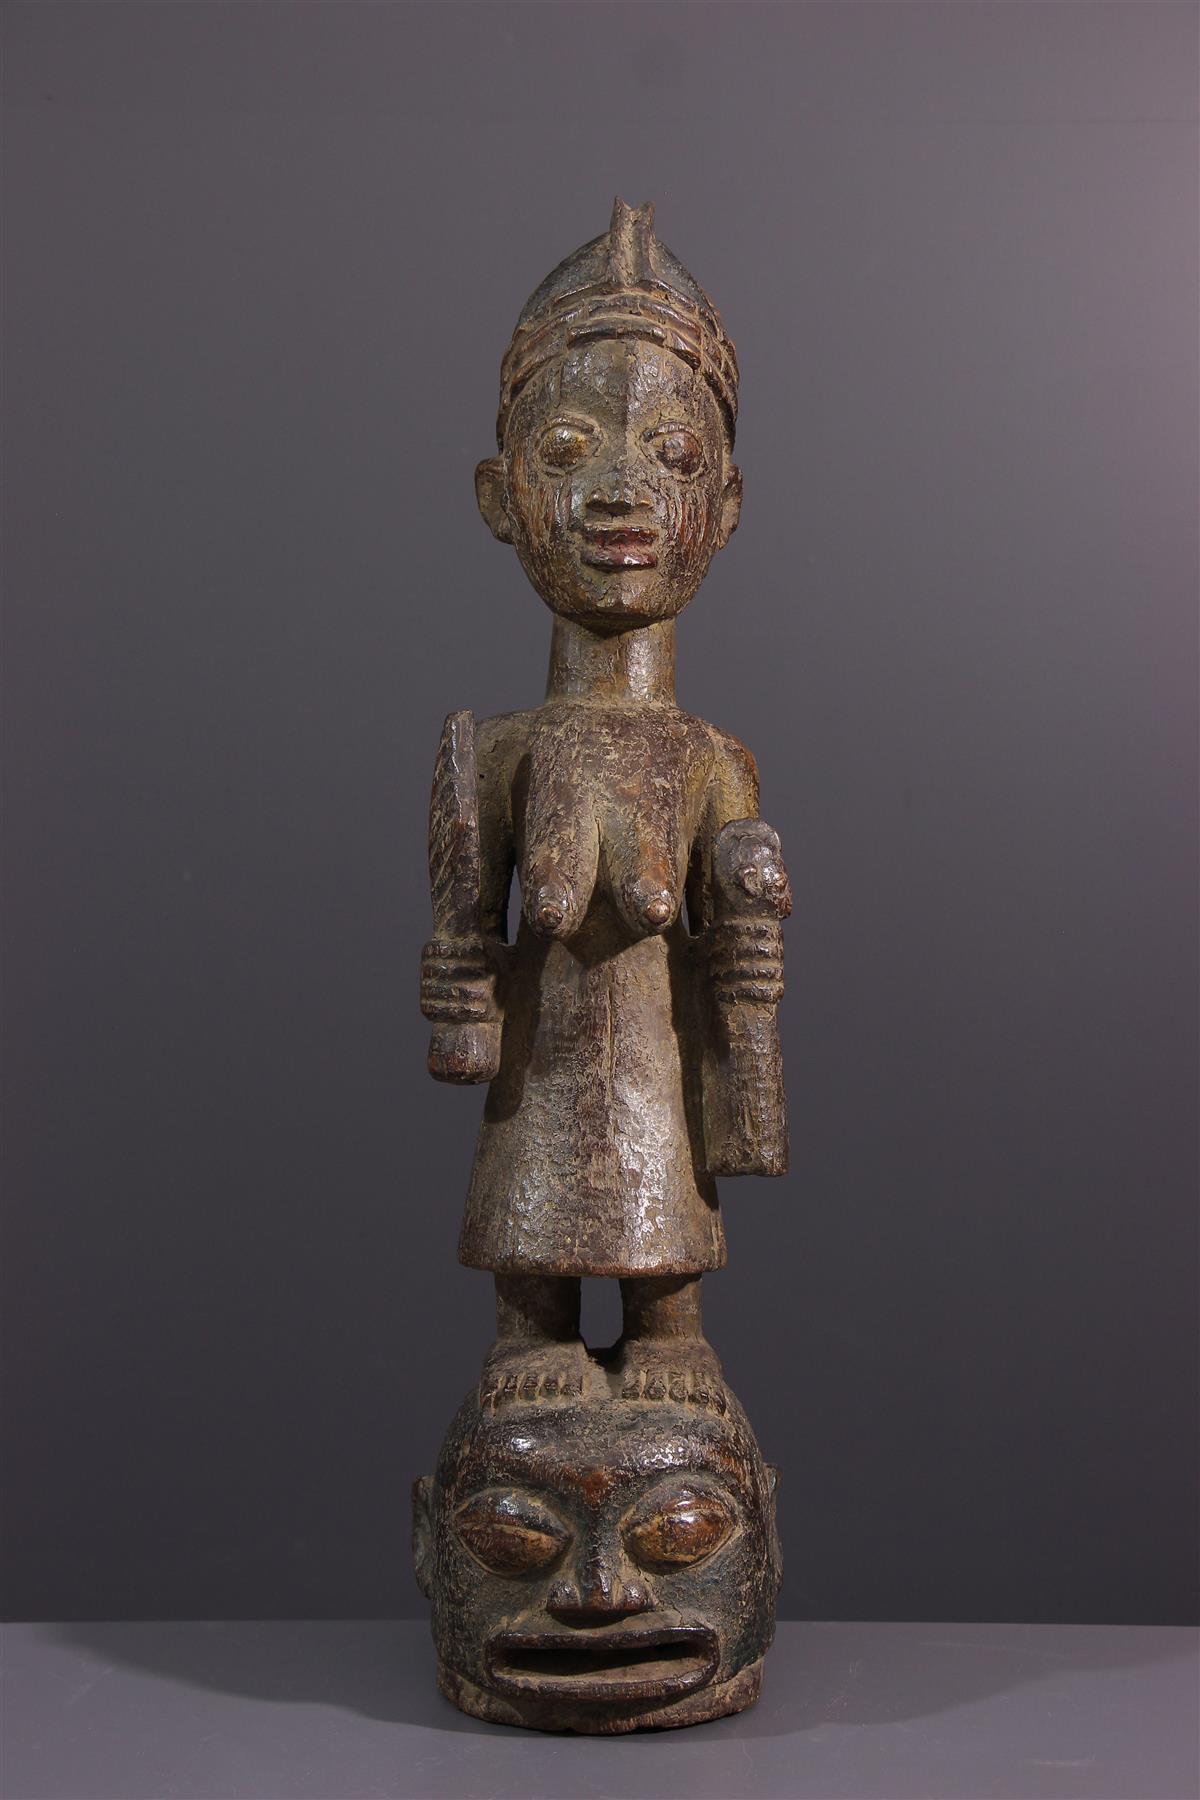 Epa mask - Tribal art